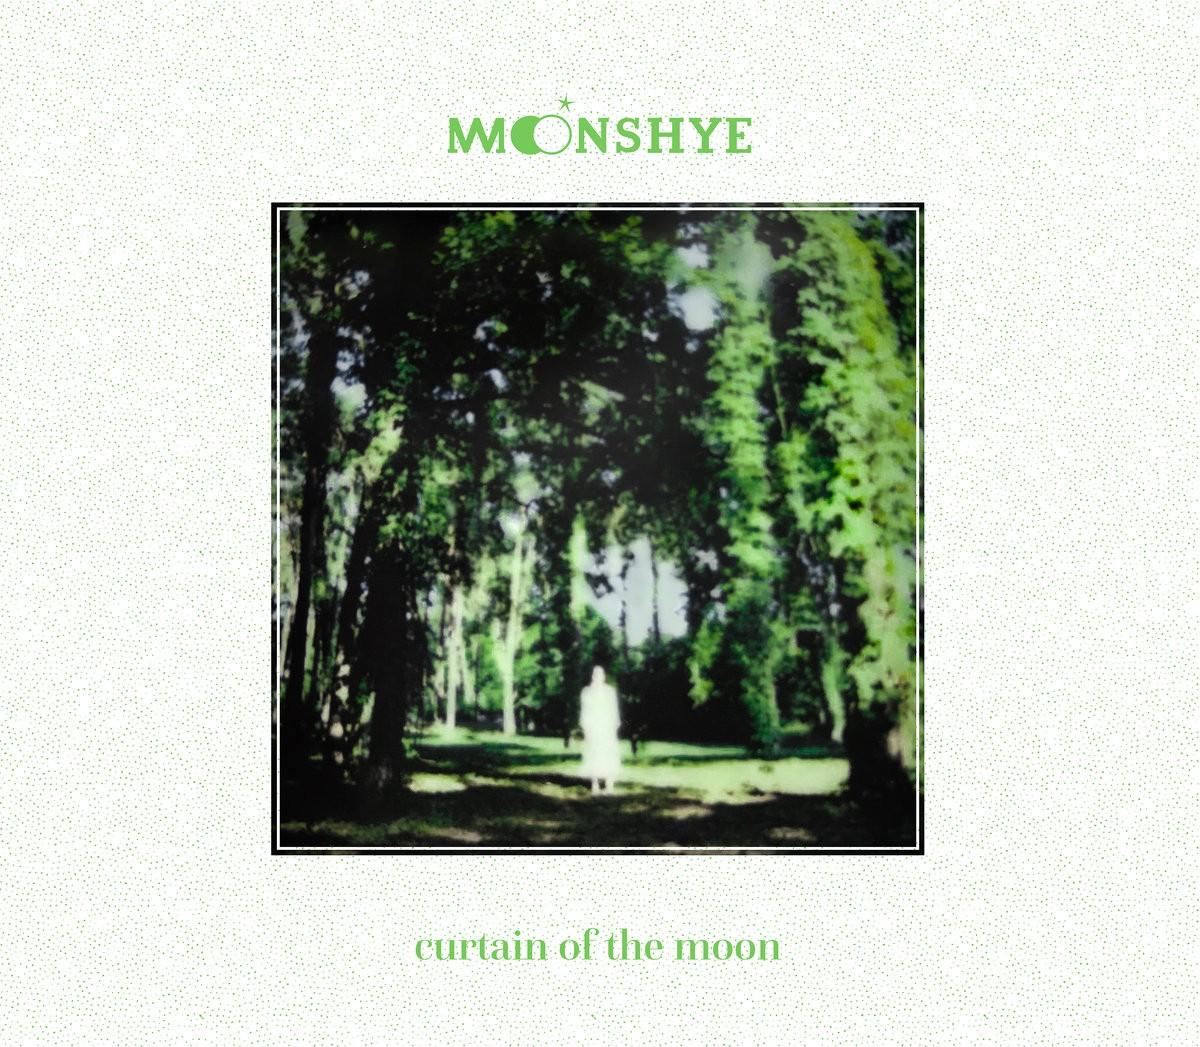 Moonshye - Curtain Of The Moon